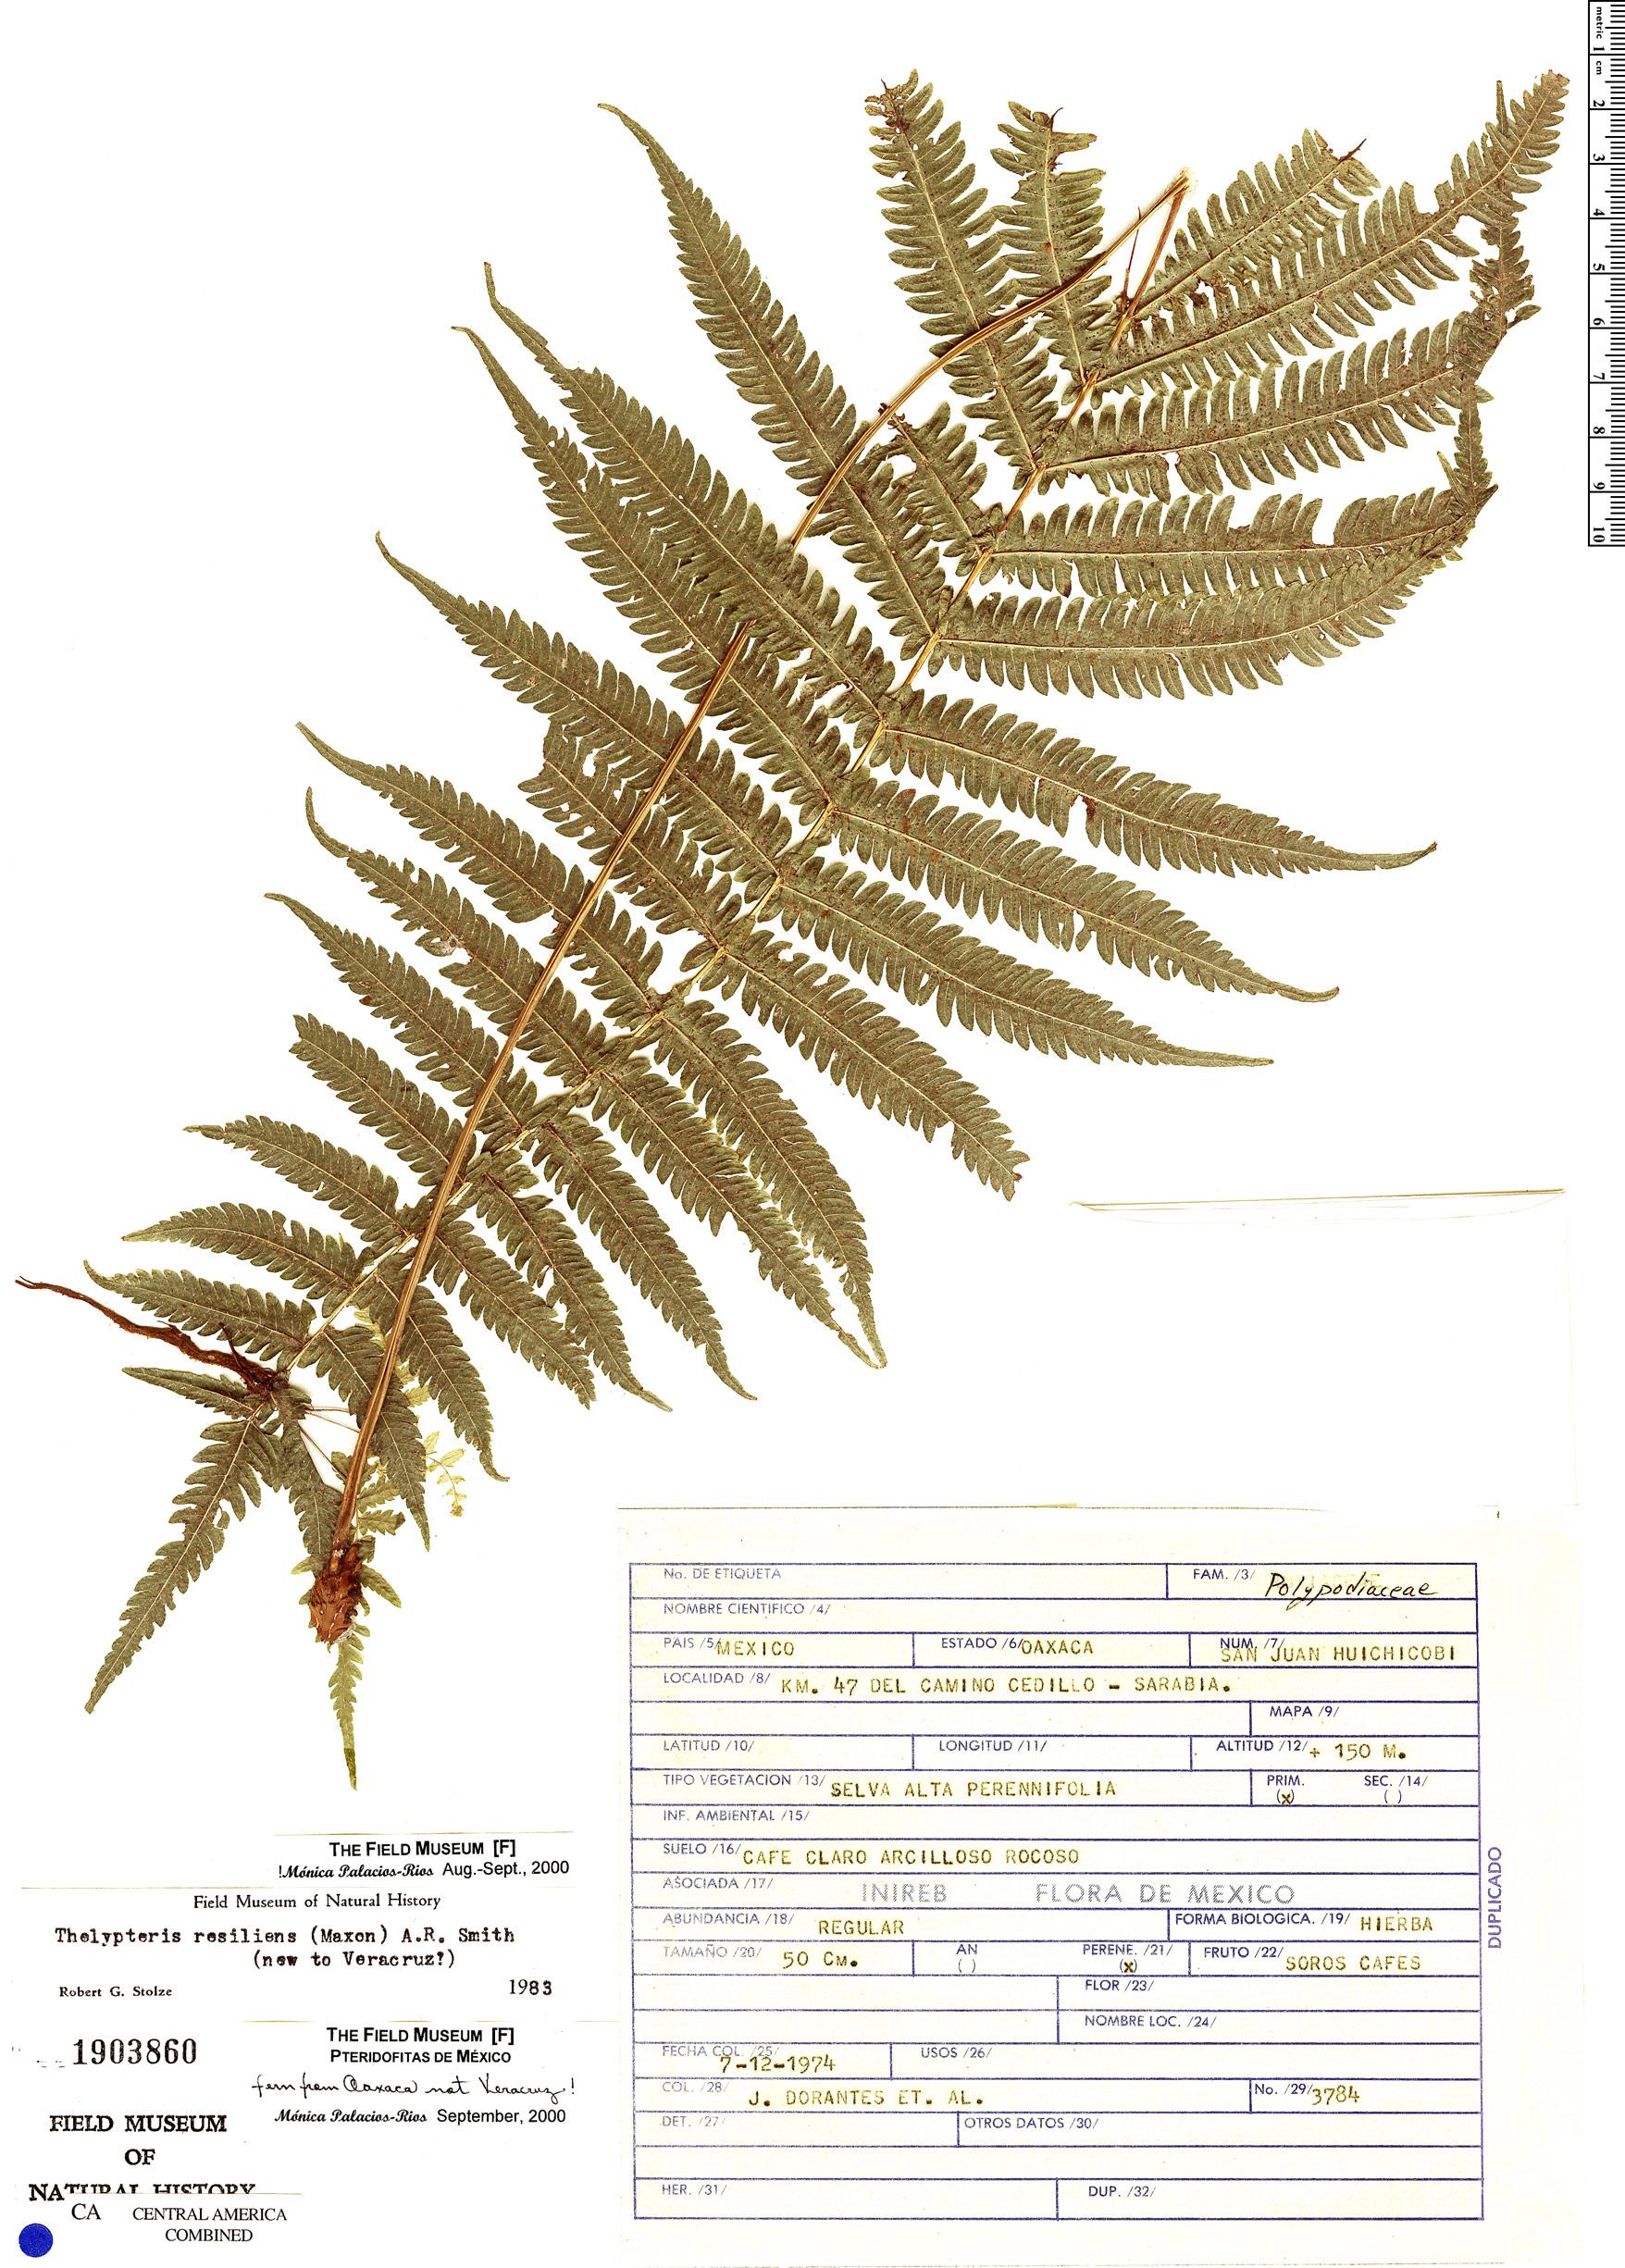 Specimen: Thelypteris resiliens